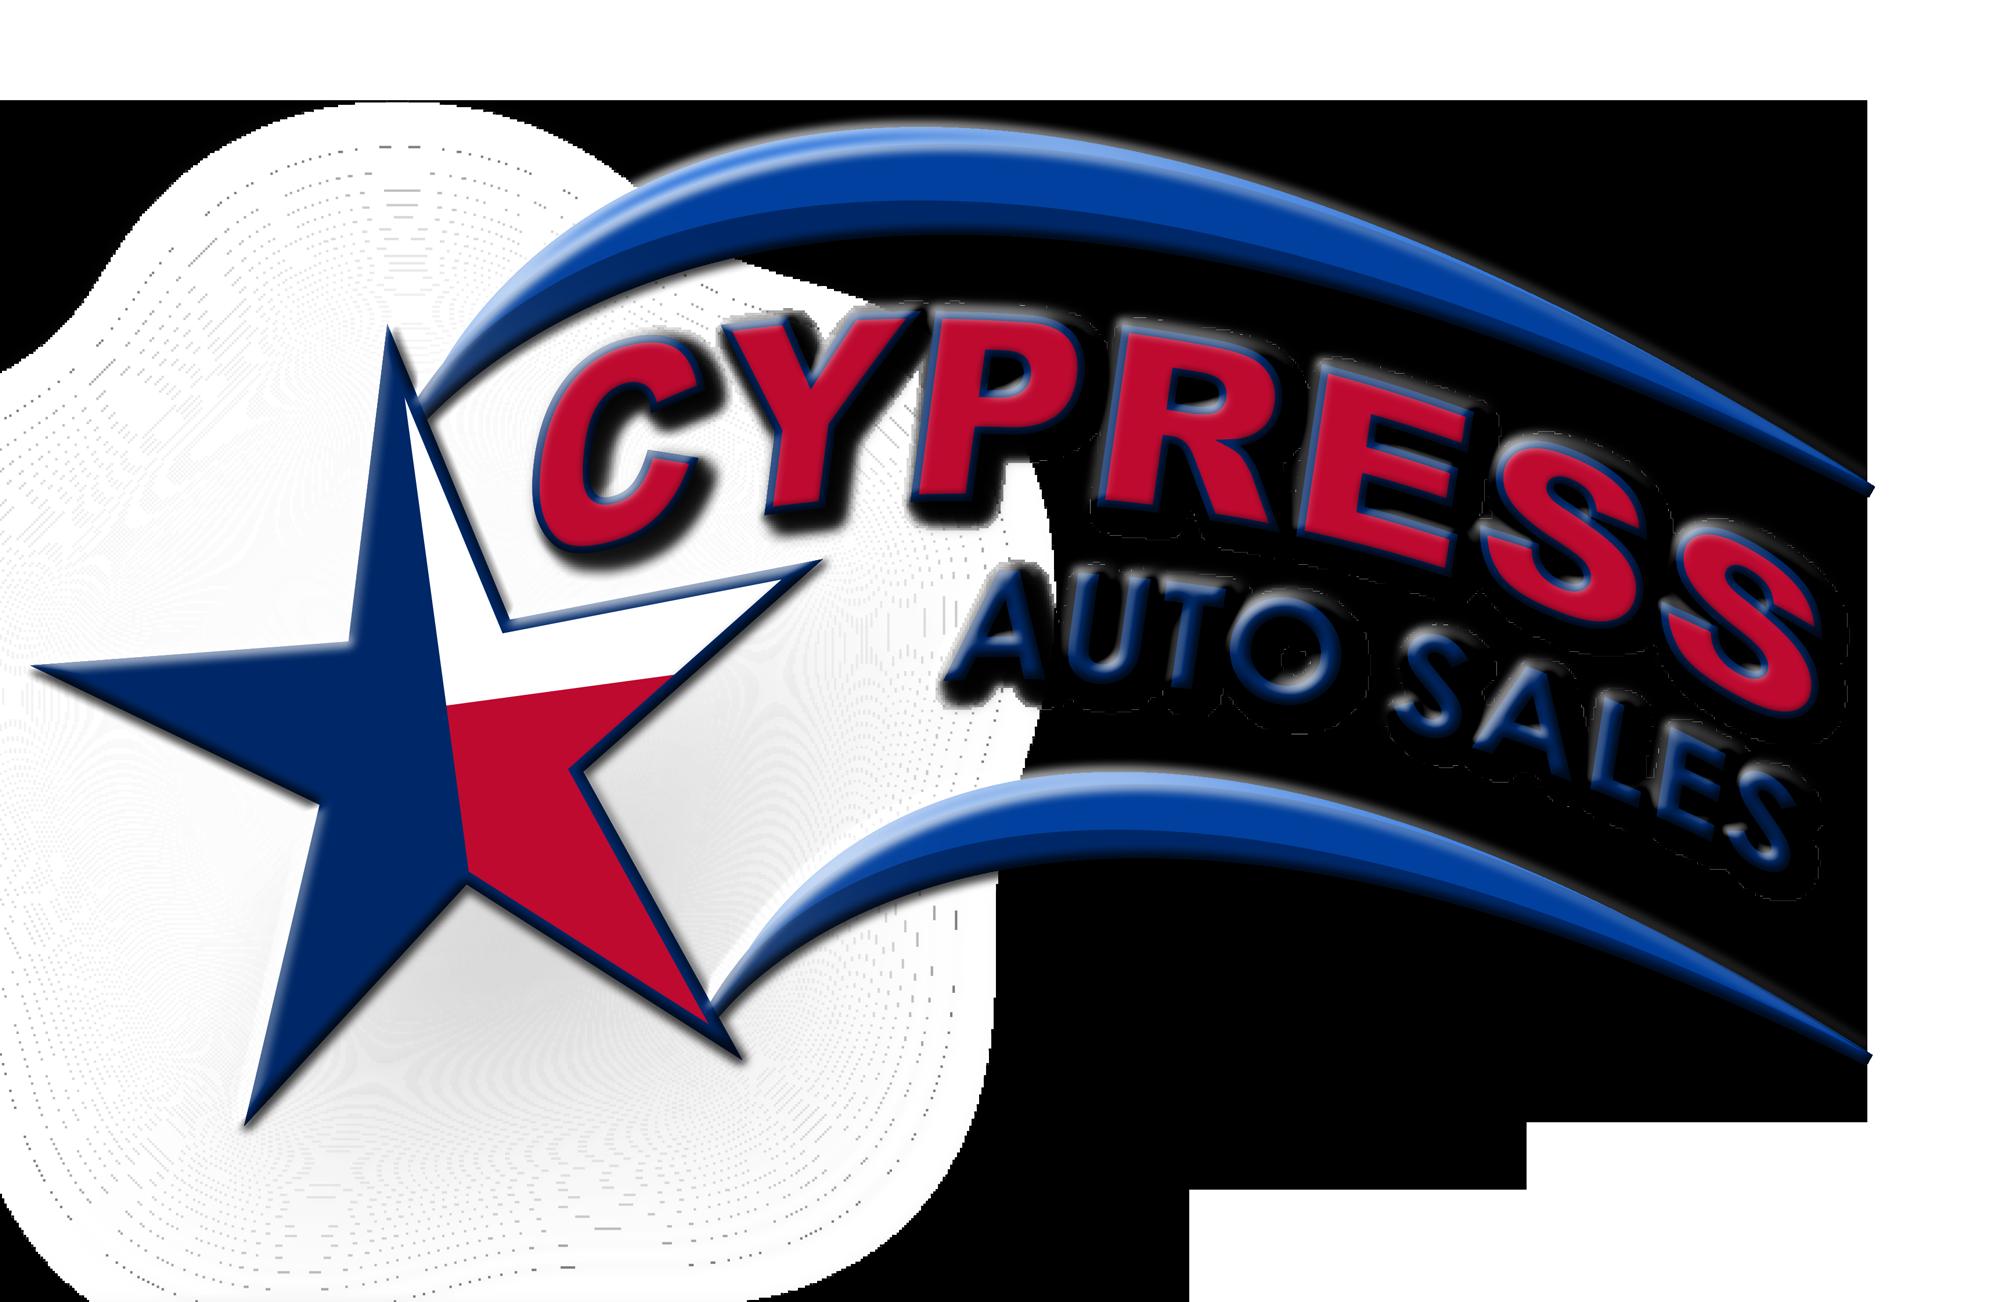 Cypress Auto Sales